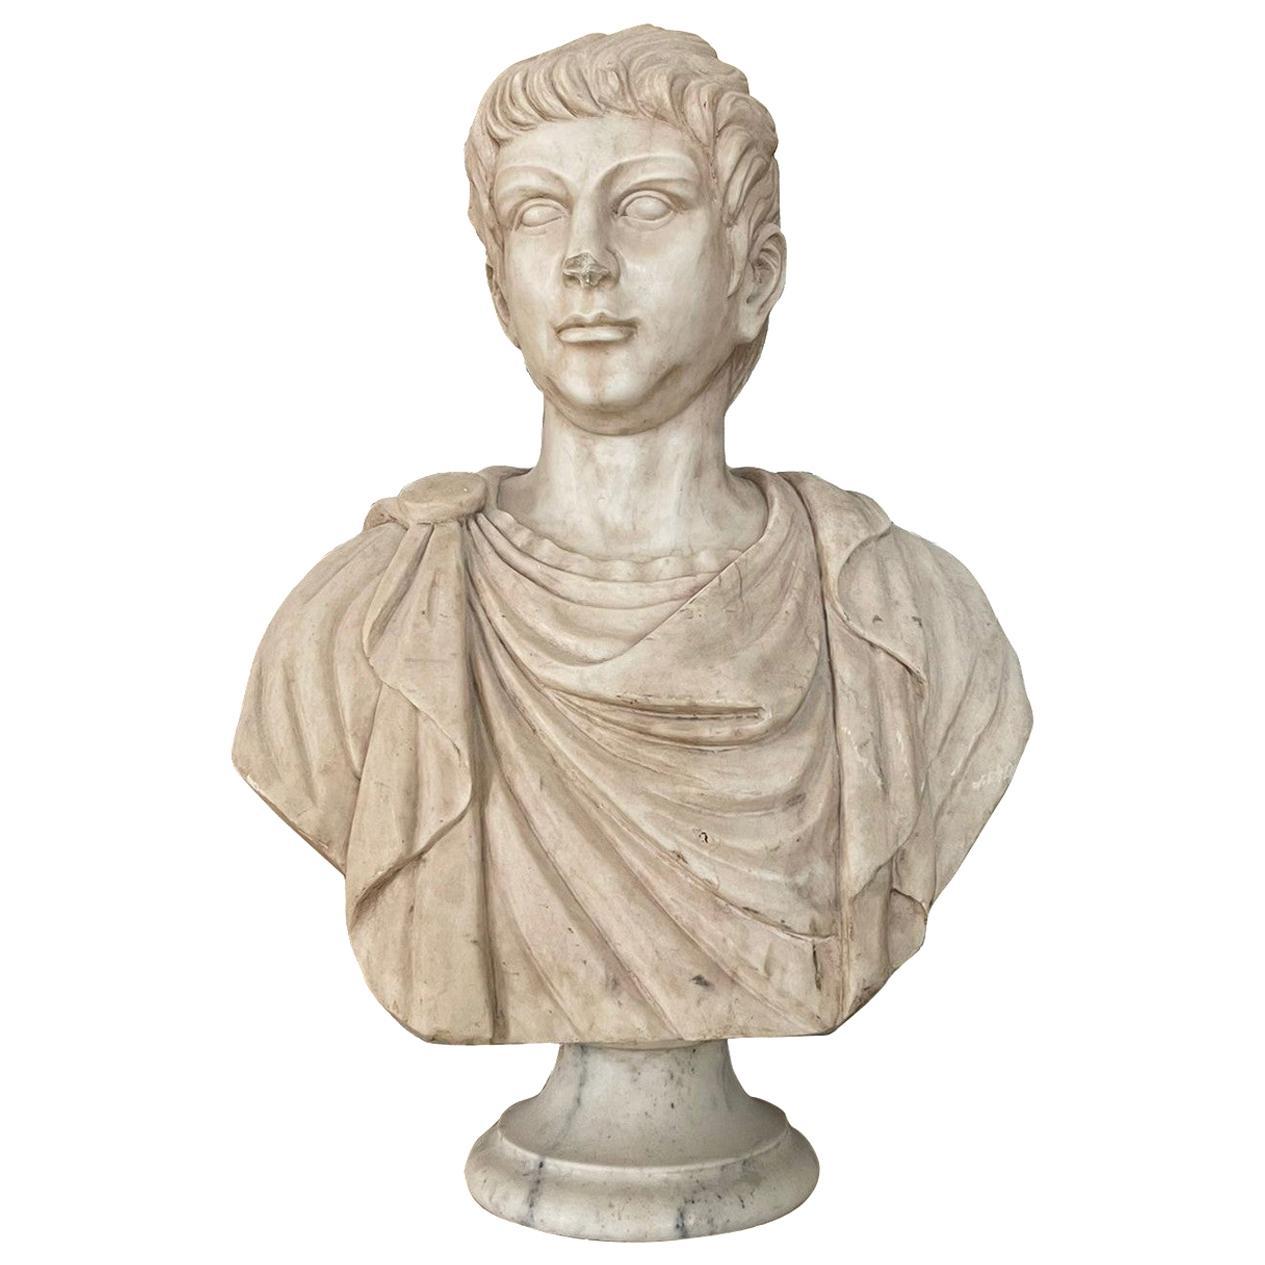 Marble Sculpture Bust Of Emperor Julius Caesar After The Antique Grand Tour